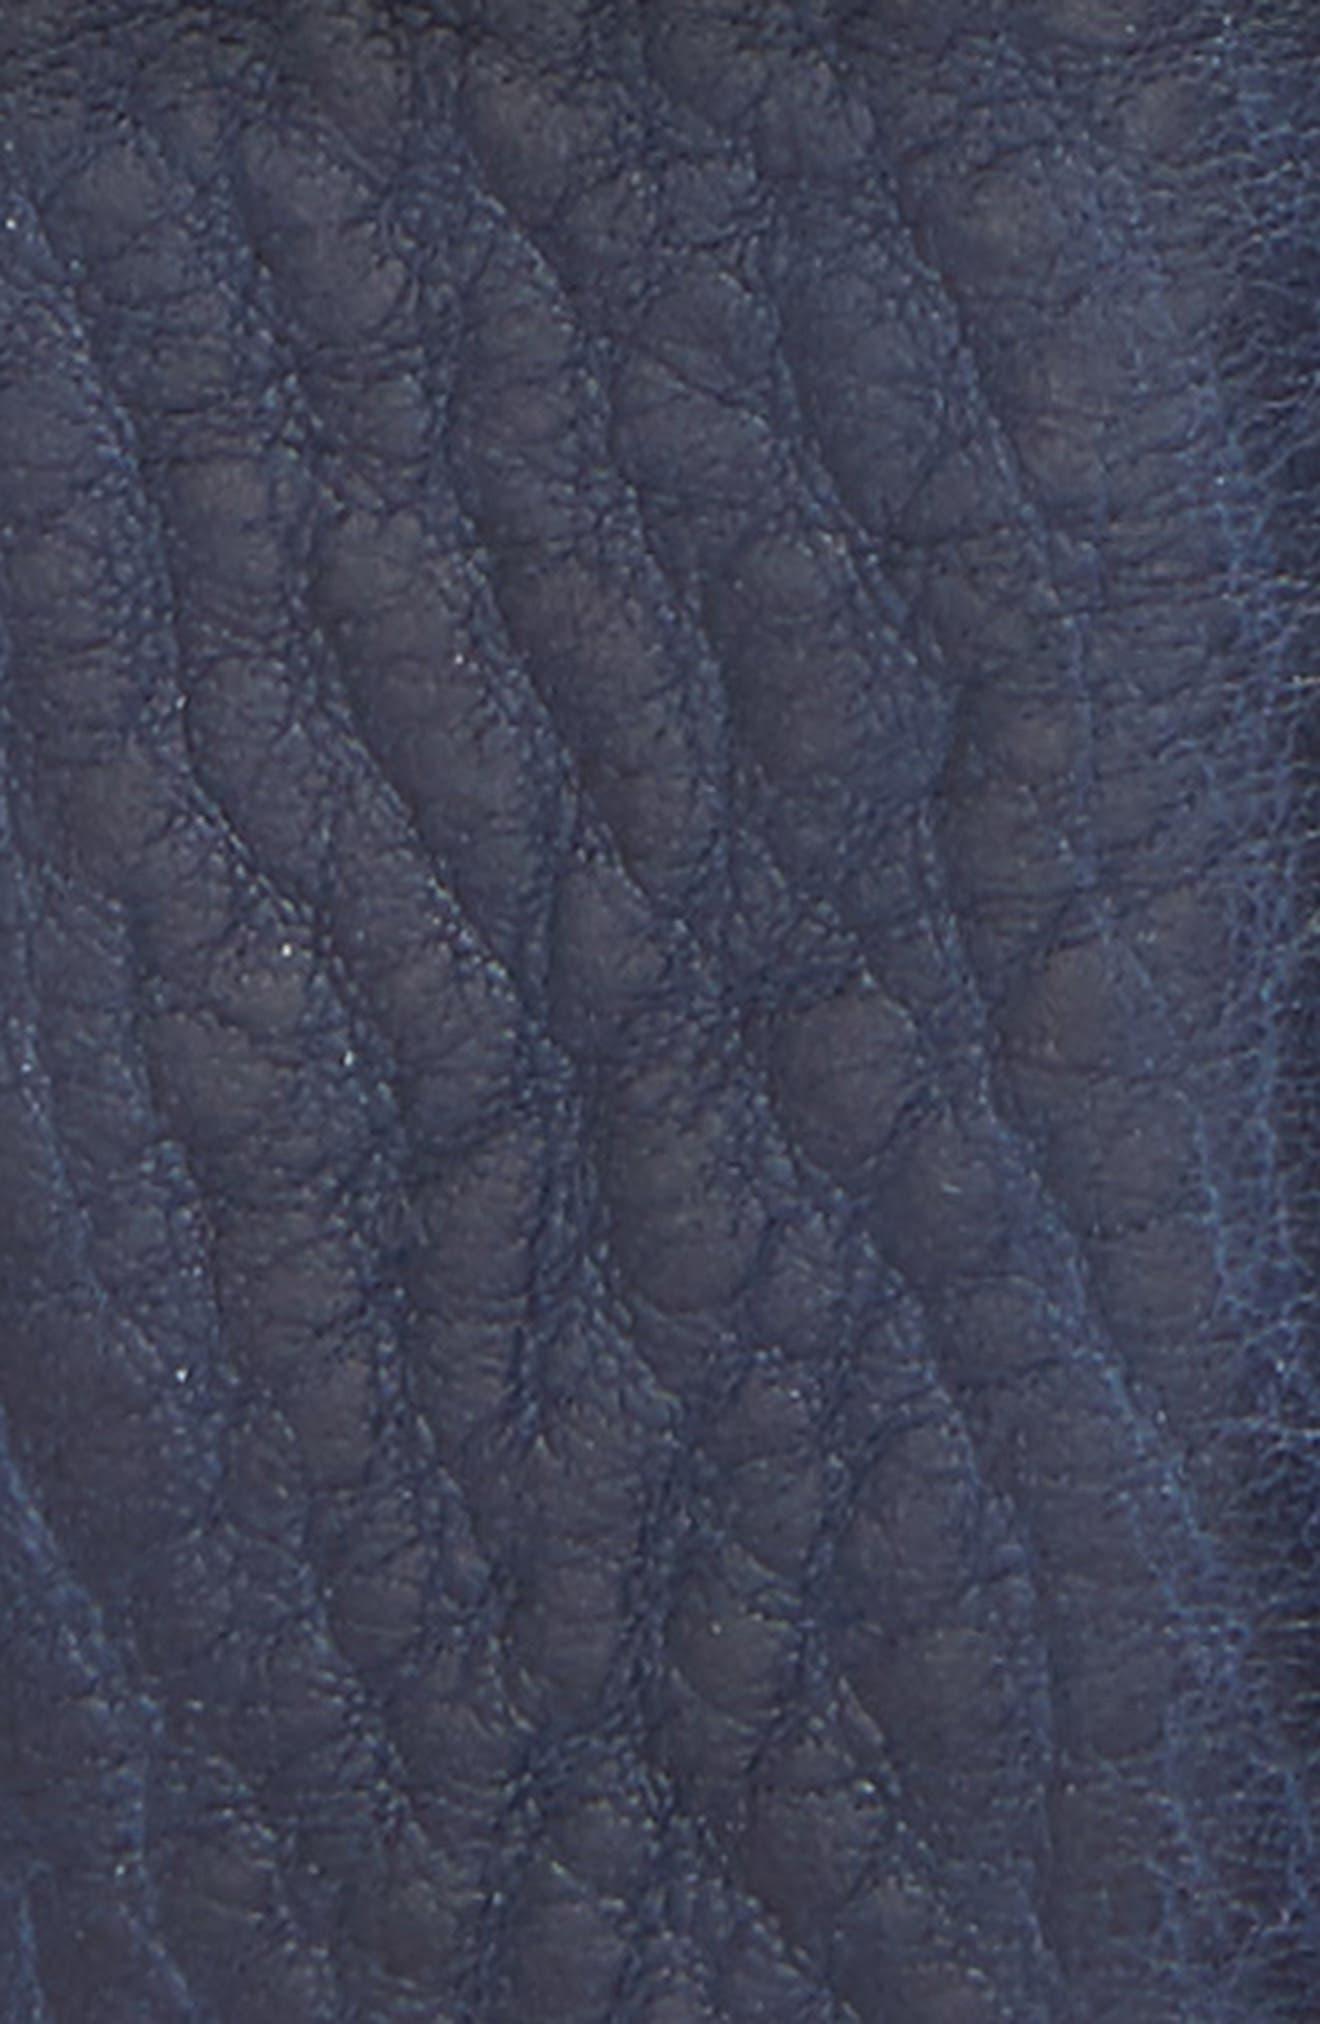 Cubes Leather Belt,                             Alternate thumbnail 2, color,                             NAVY